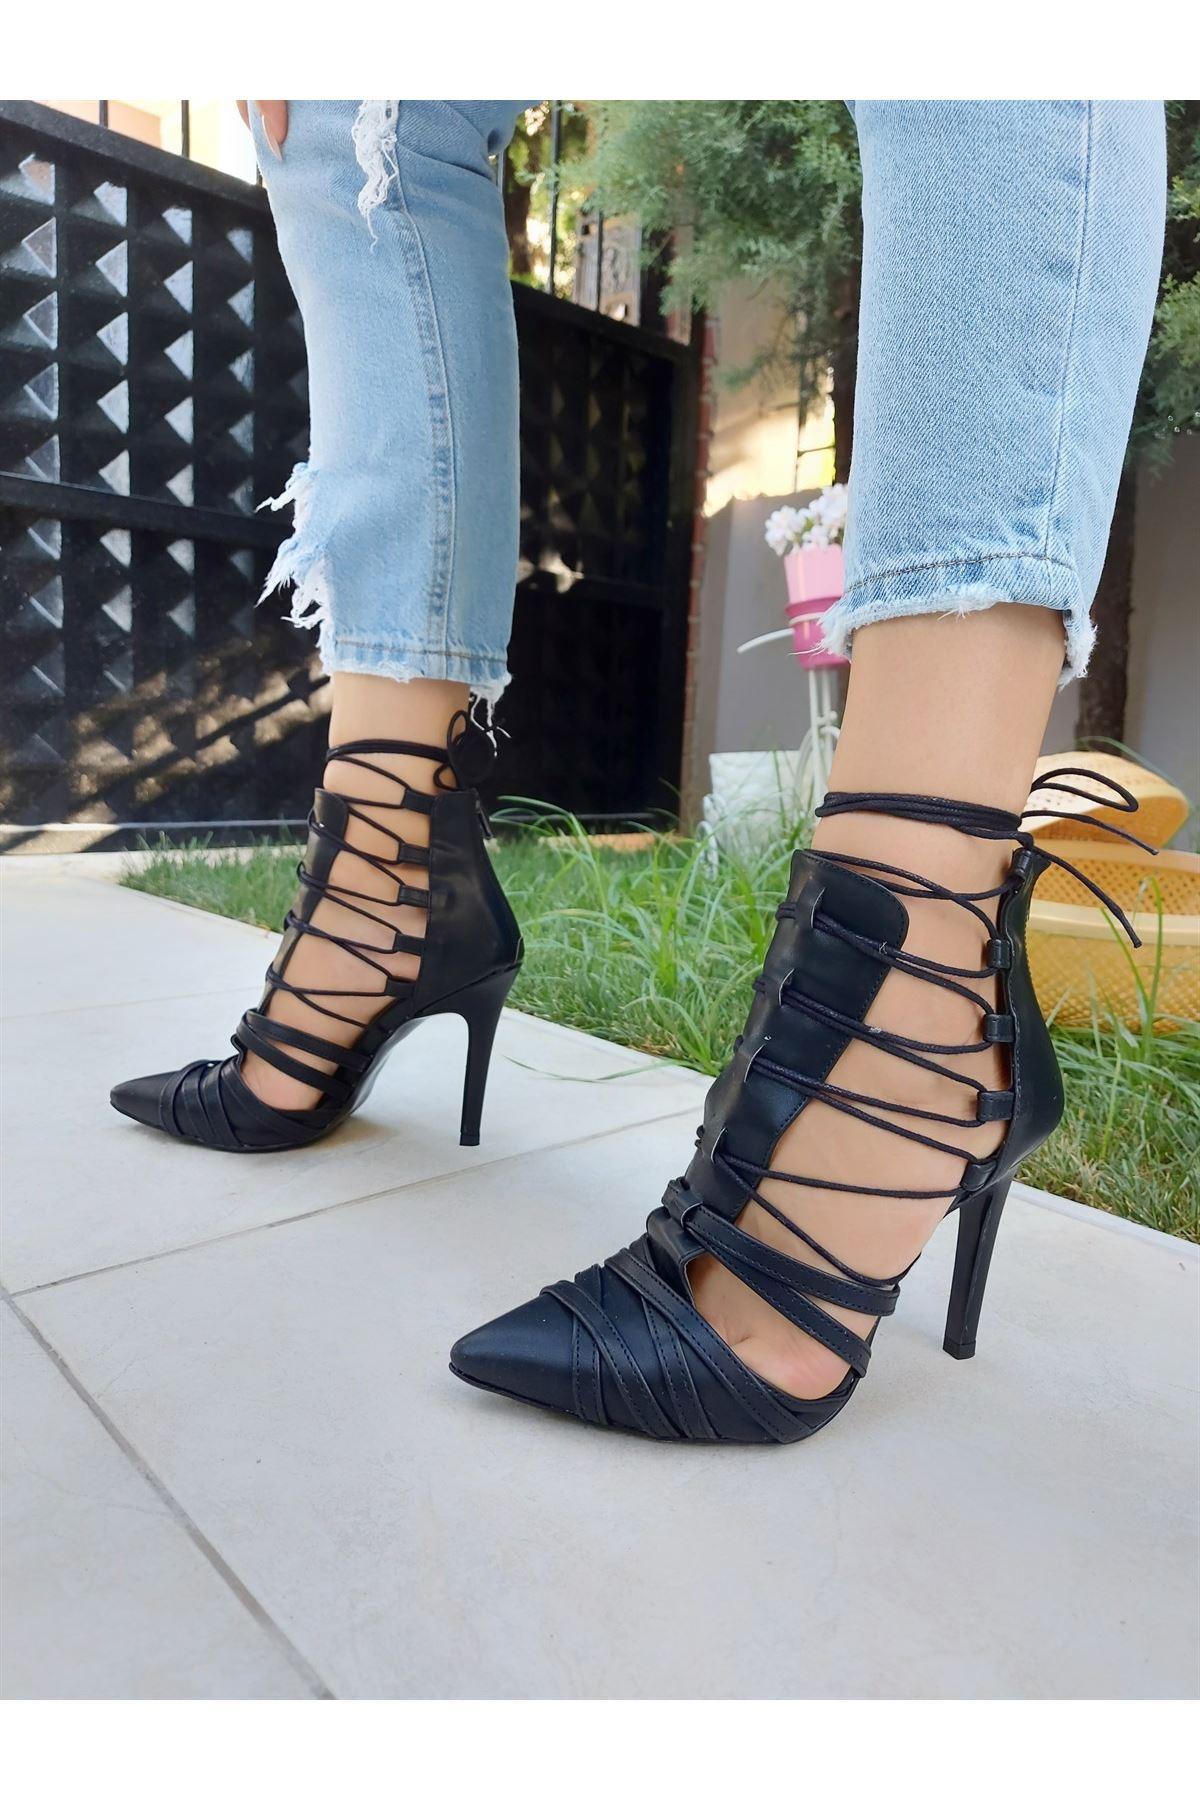 Long Siyah Cilt Bağcıklı Topuklu Ayakkabı